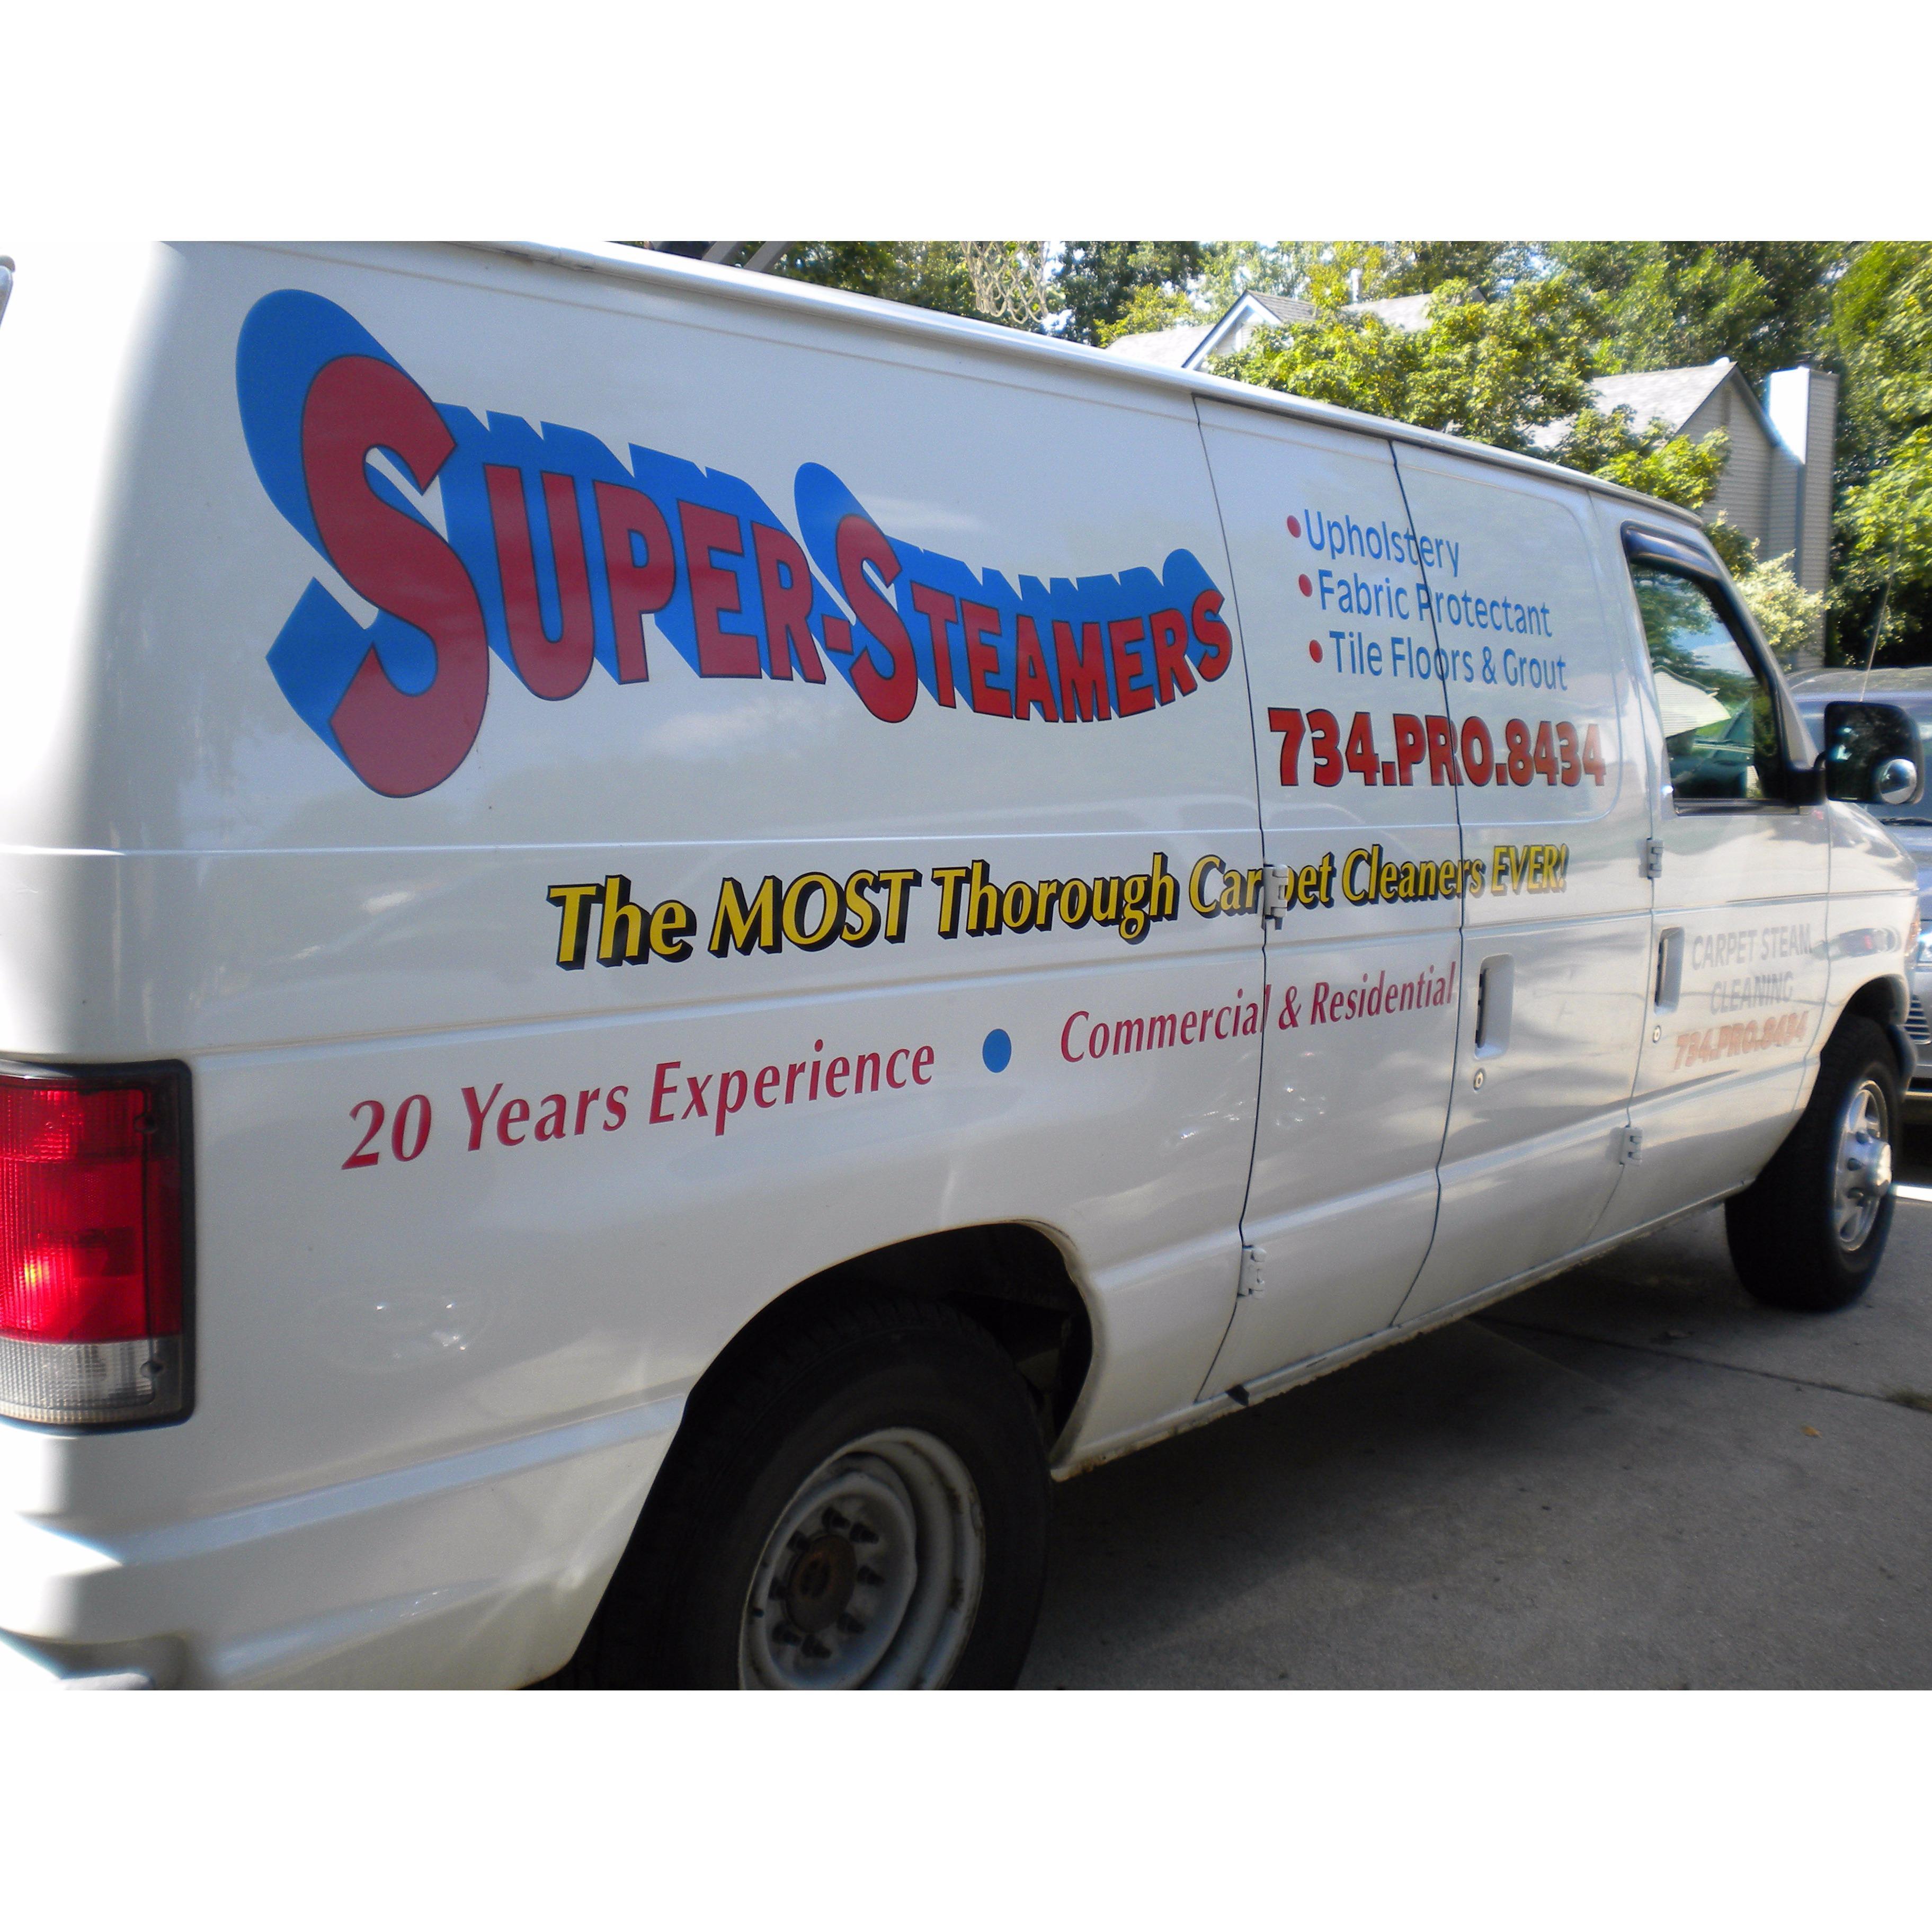 Super Steamers Carpet Cleaners - Canton, MI 48187 - (734)776-8434 | ShowMeLocal.com